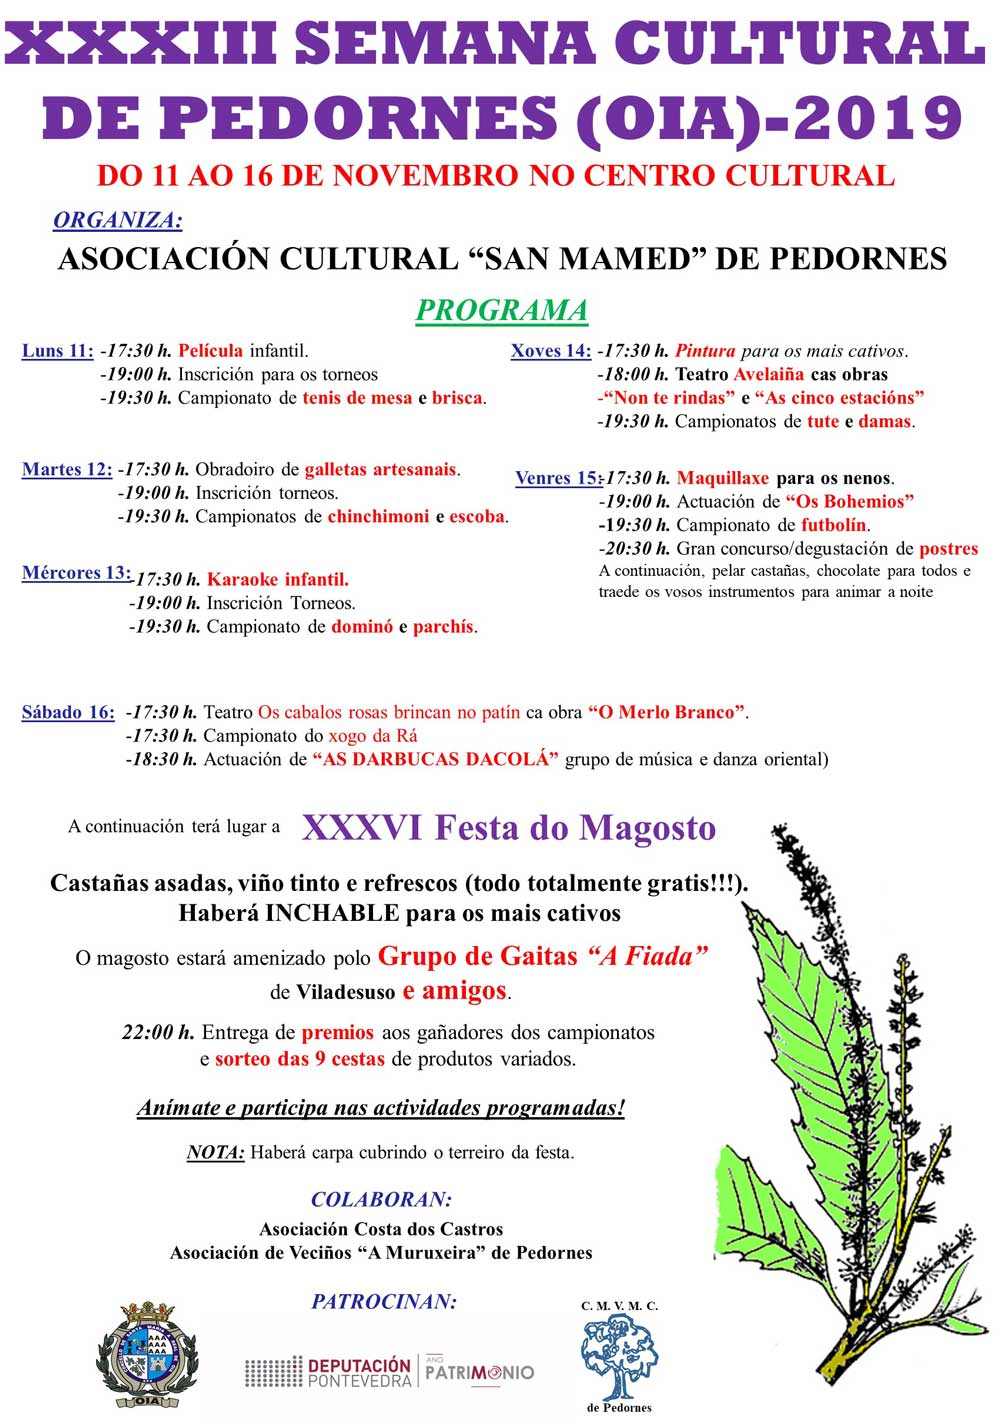 XXXIII Semana Cultural Pedornes